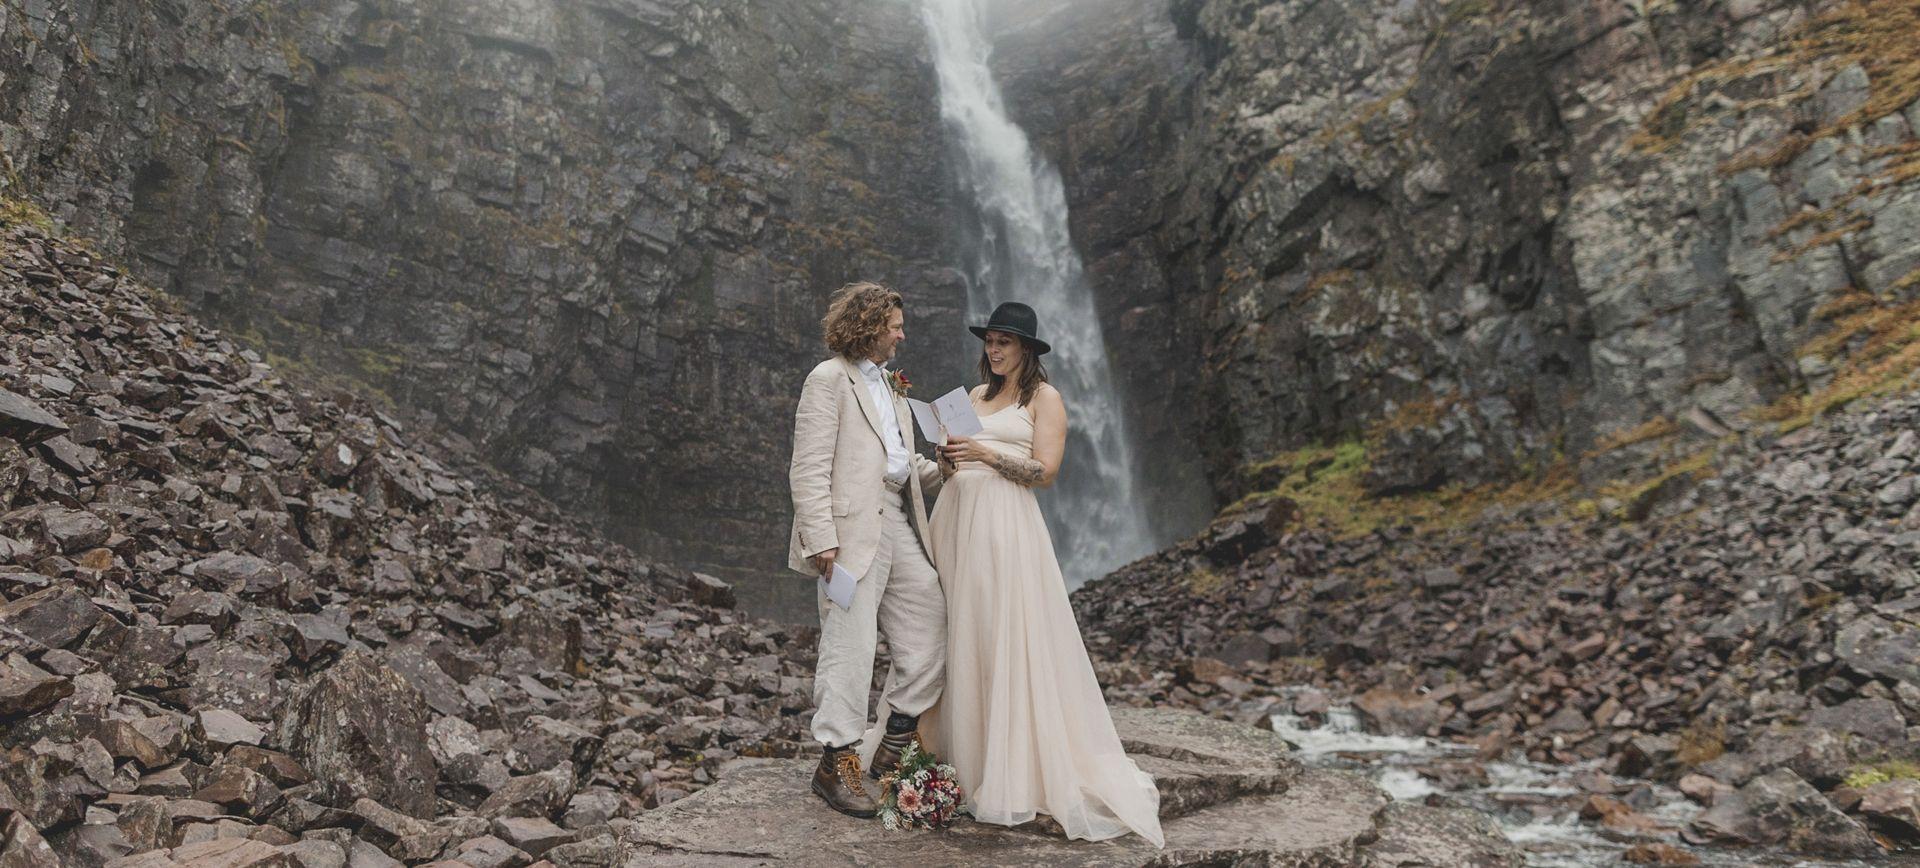 glamping wedding in sweden - waterfall adventure wedding